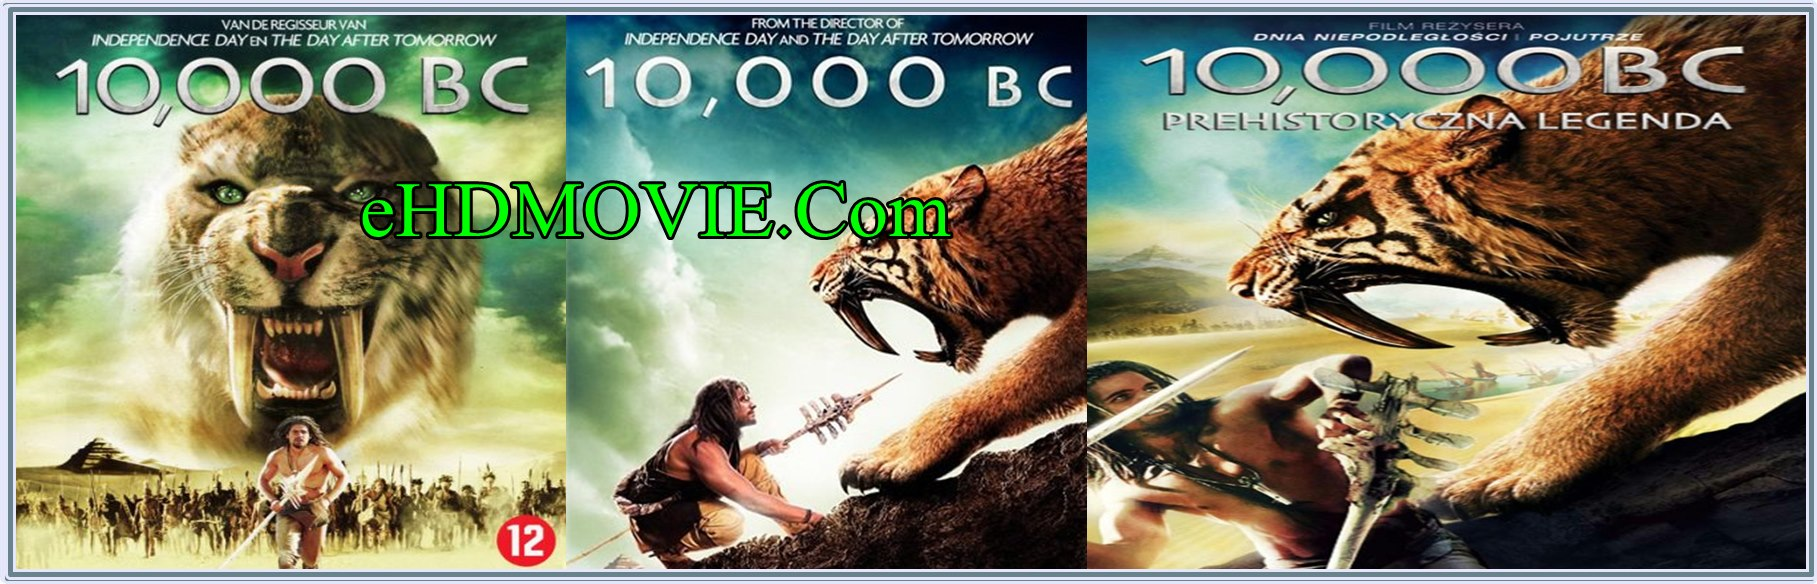 10,000 BC 2008 Full Movie Dual Audio [Hindi – English] 720p - 480p ORG BRRip 350MB - 950MB ESubs Free Download